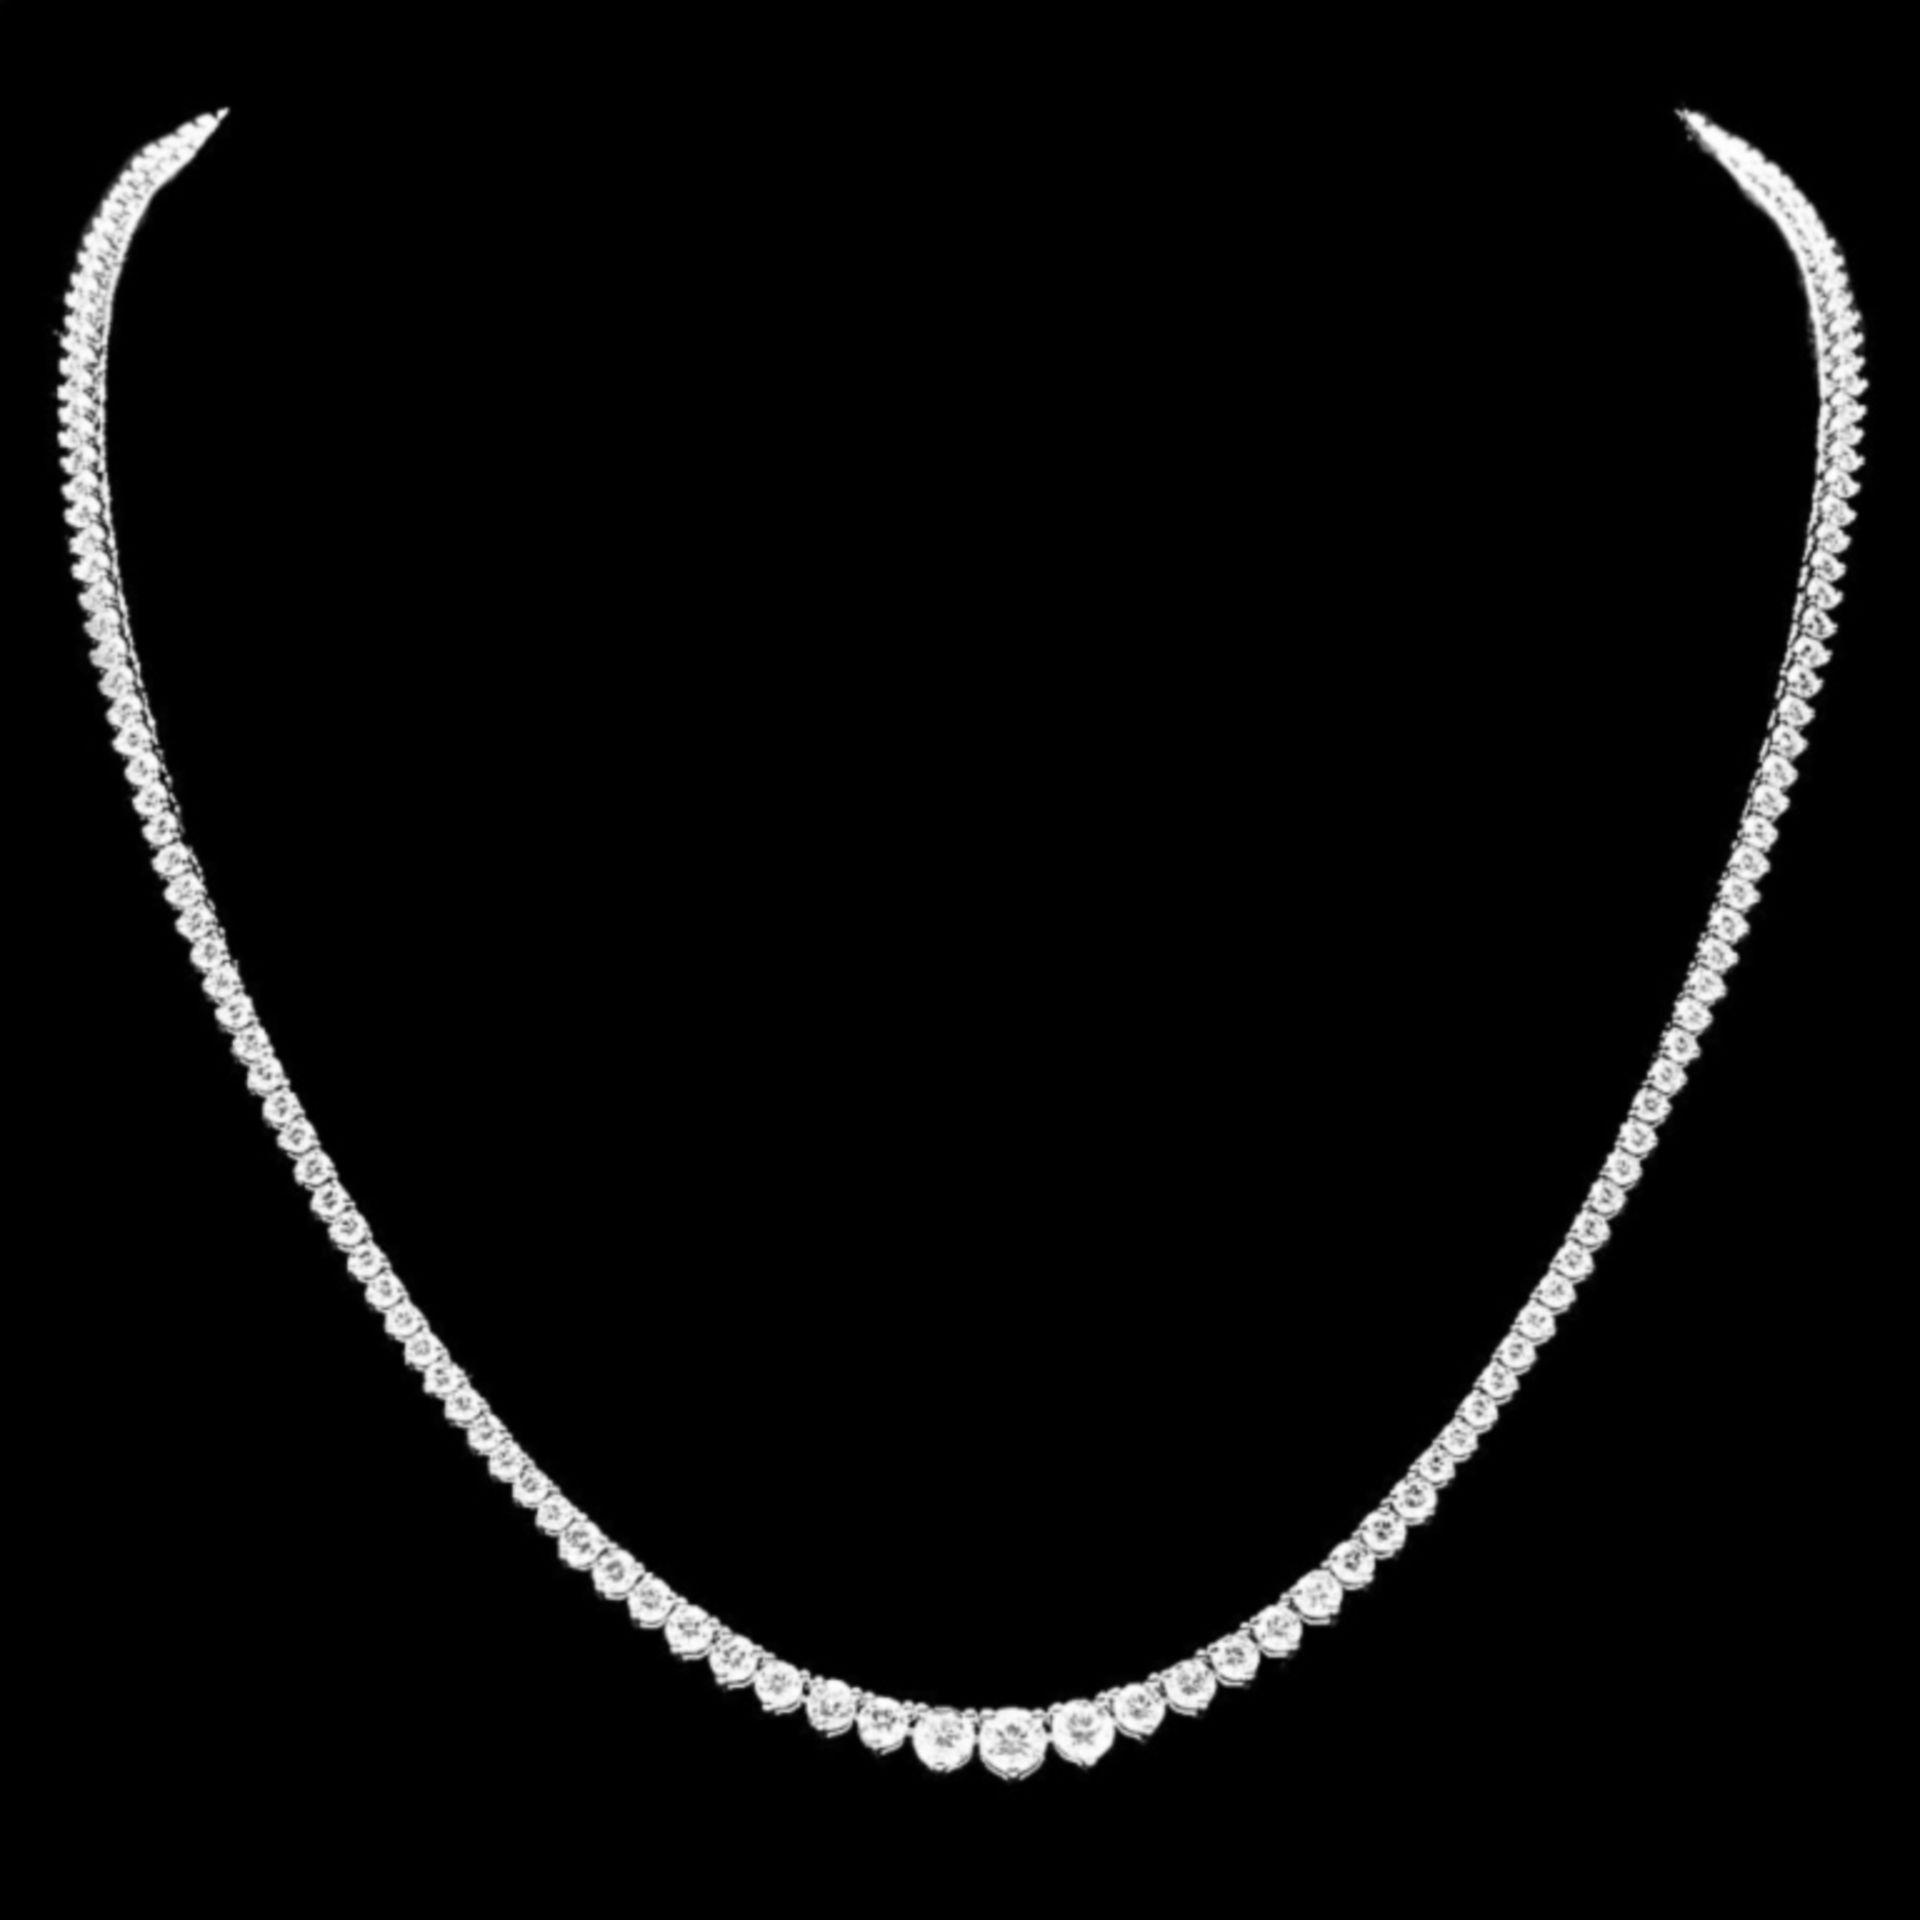 18k White Gold 7.80ct Diamond Necklace